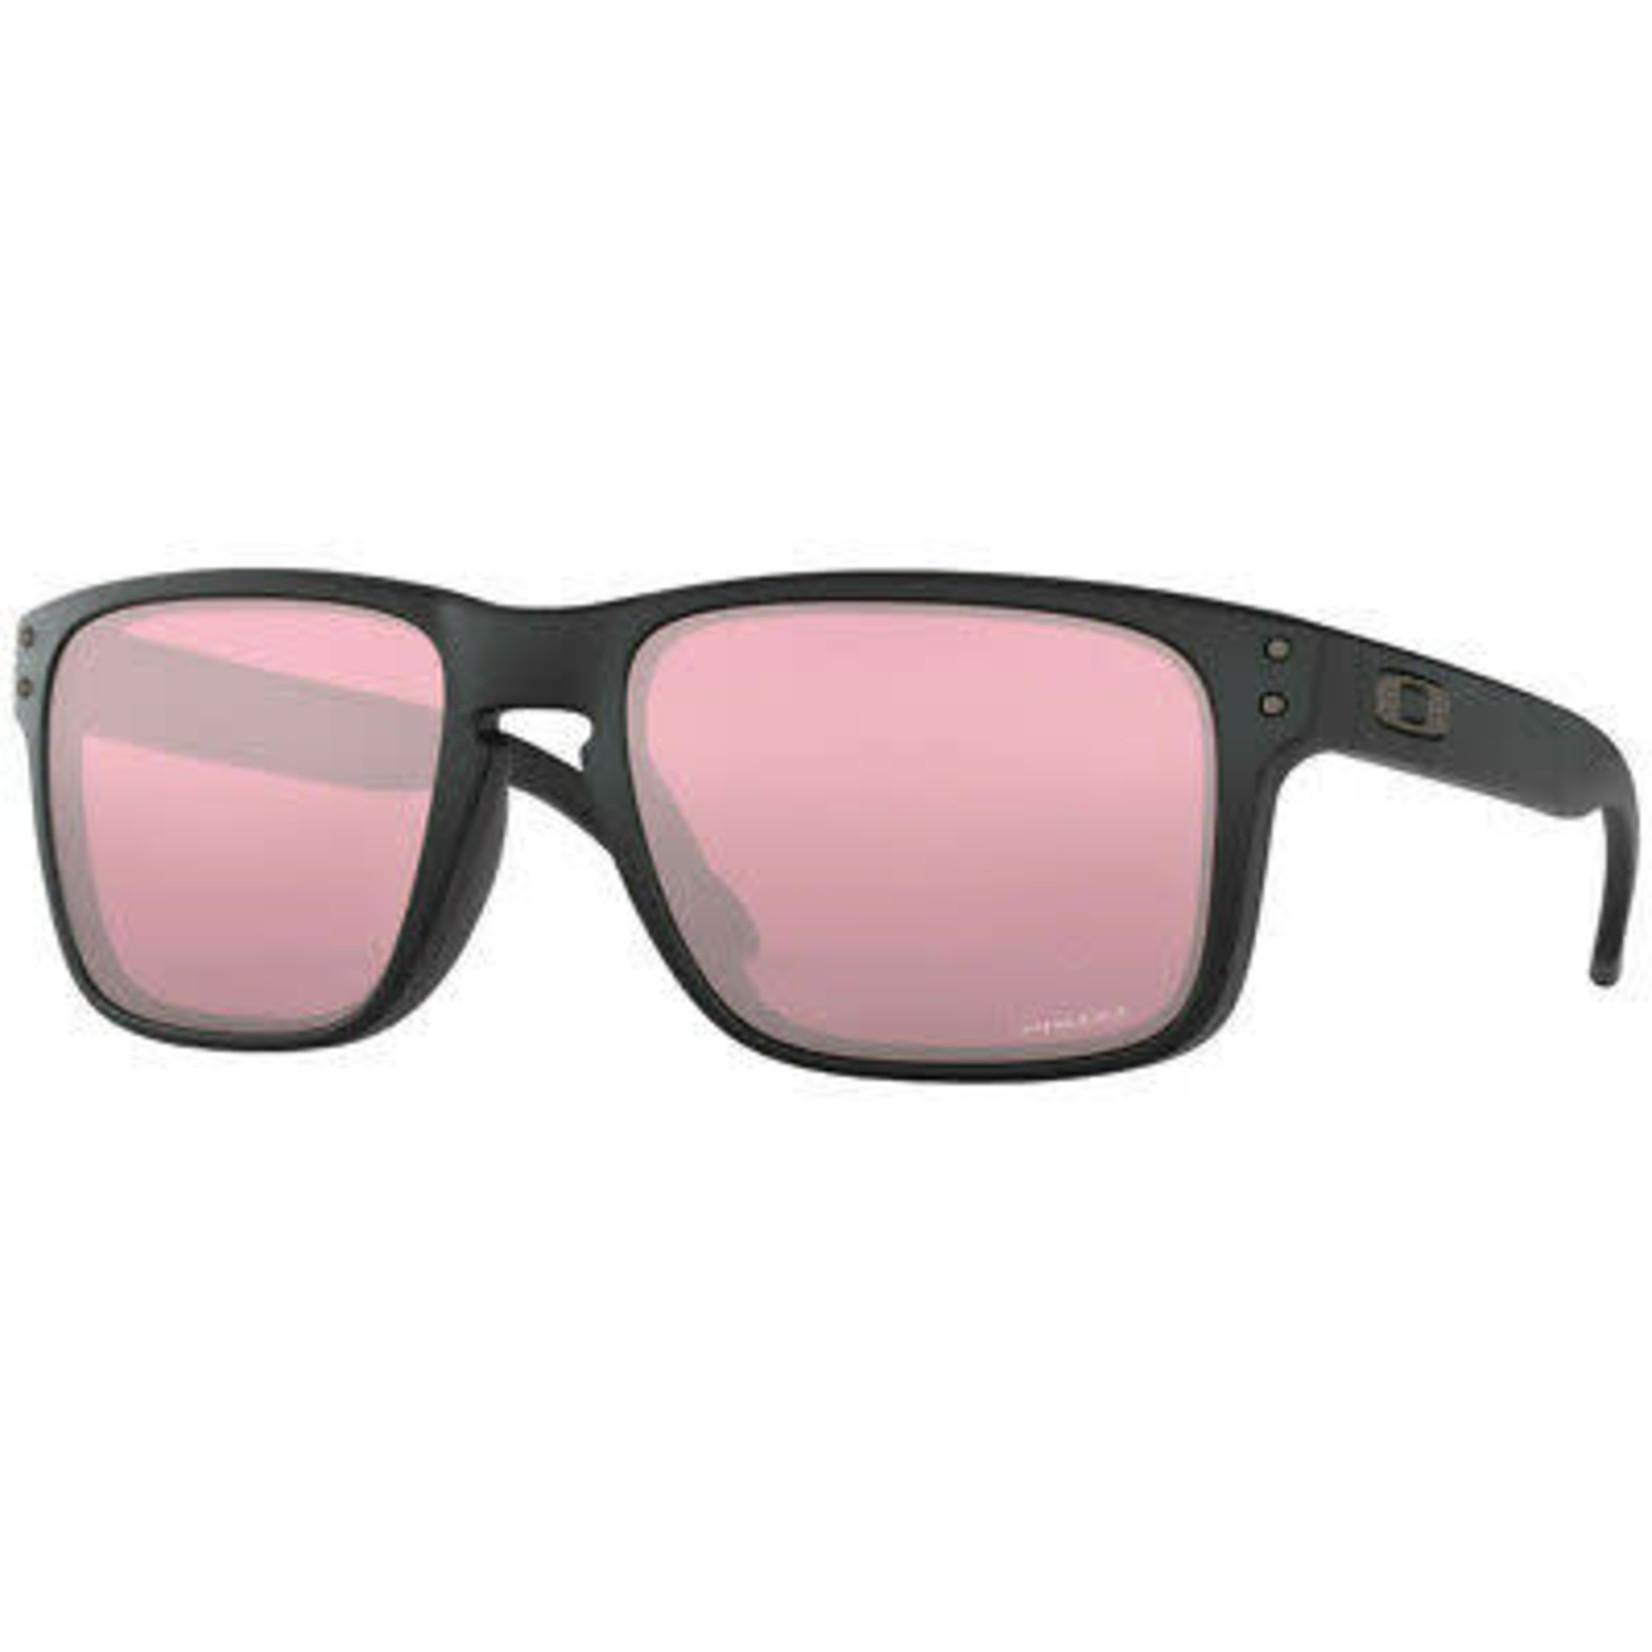 Oakley Oakley Sunglasses, Holbrook, Matte Blk, Prizm Dark Golf